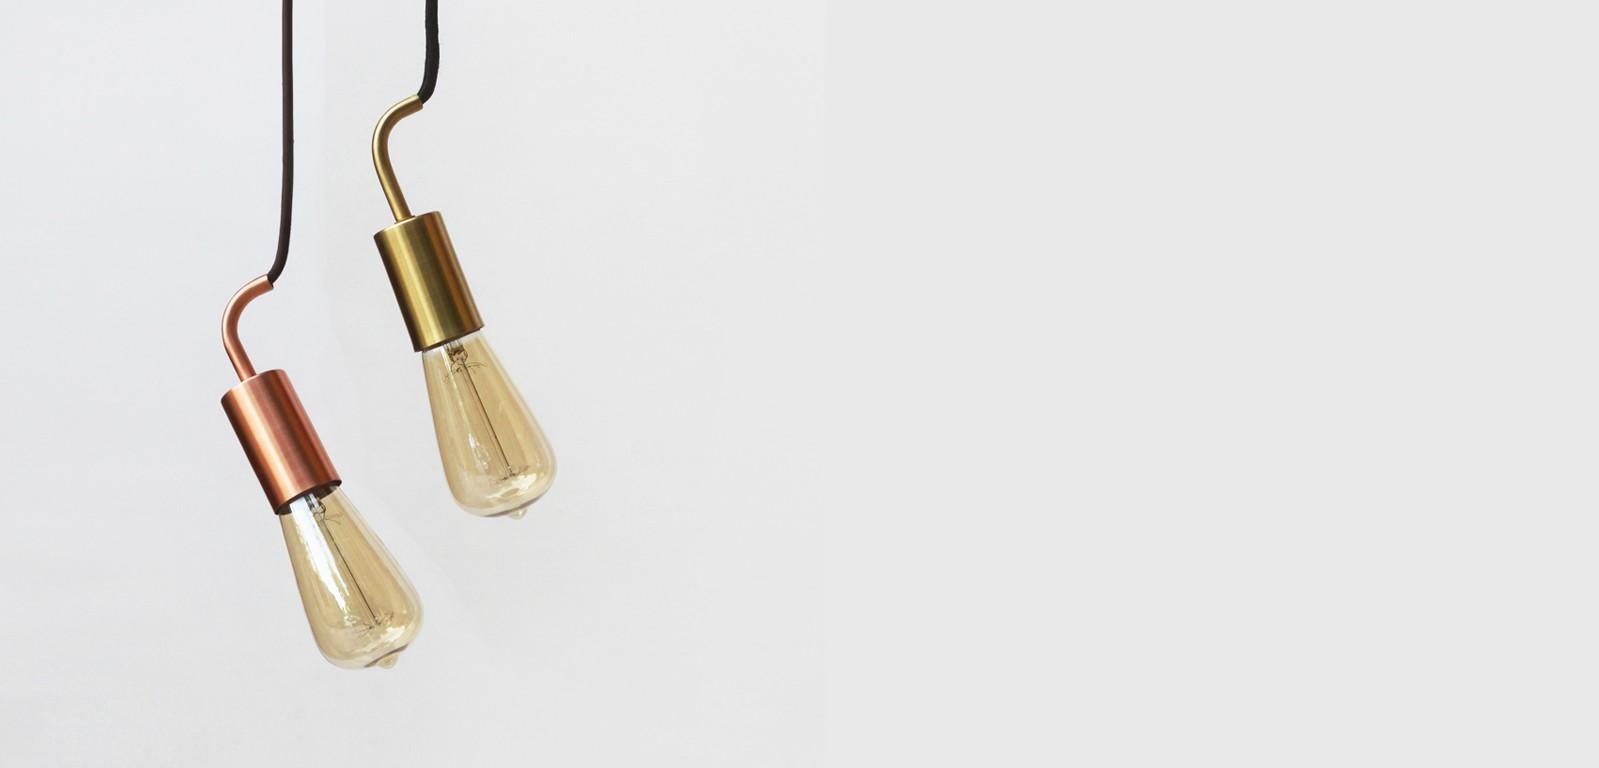 CL60-pendant-light-minimal-edison-bulb-spotlight-aluminium-brass-copper-handmade-alentes